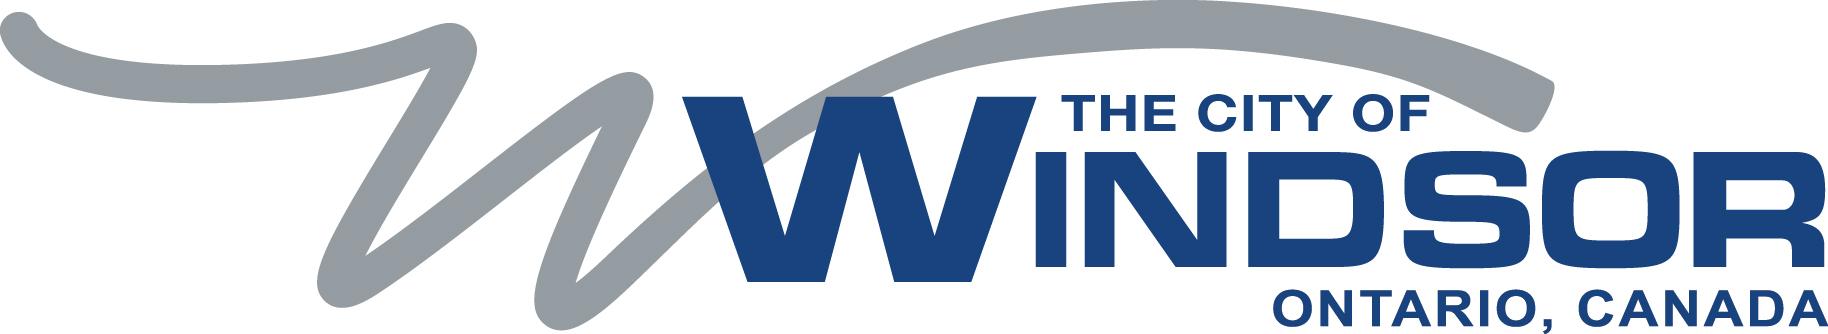 City of Windsor Logo